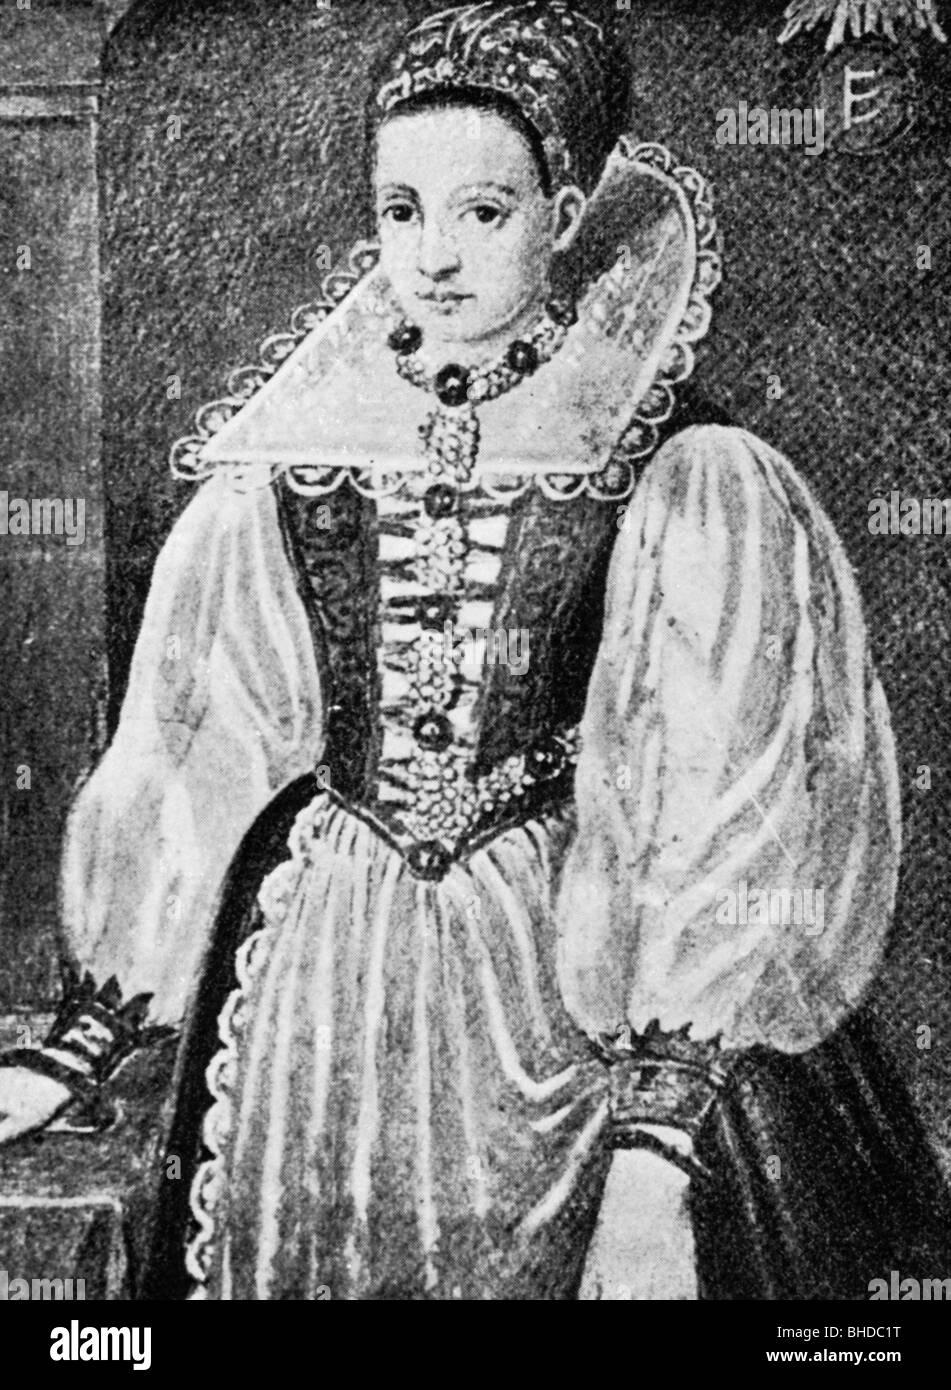 "Bathory, Elisabeth, 7.8.1560 - 21.8.1614, countess Nadasdy, ""Blood Countess"", Hungarian serial killer, half length, Stock Photo"